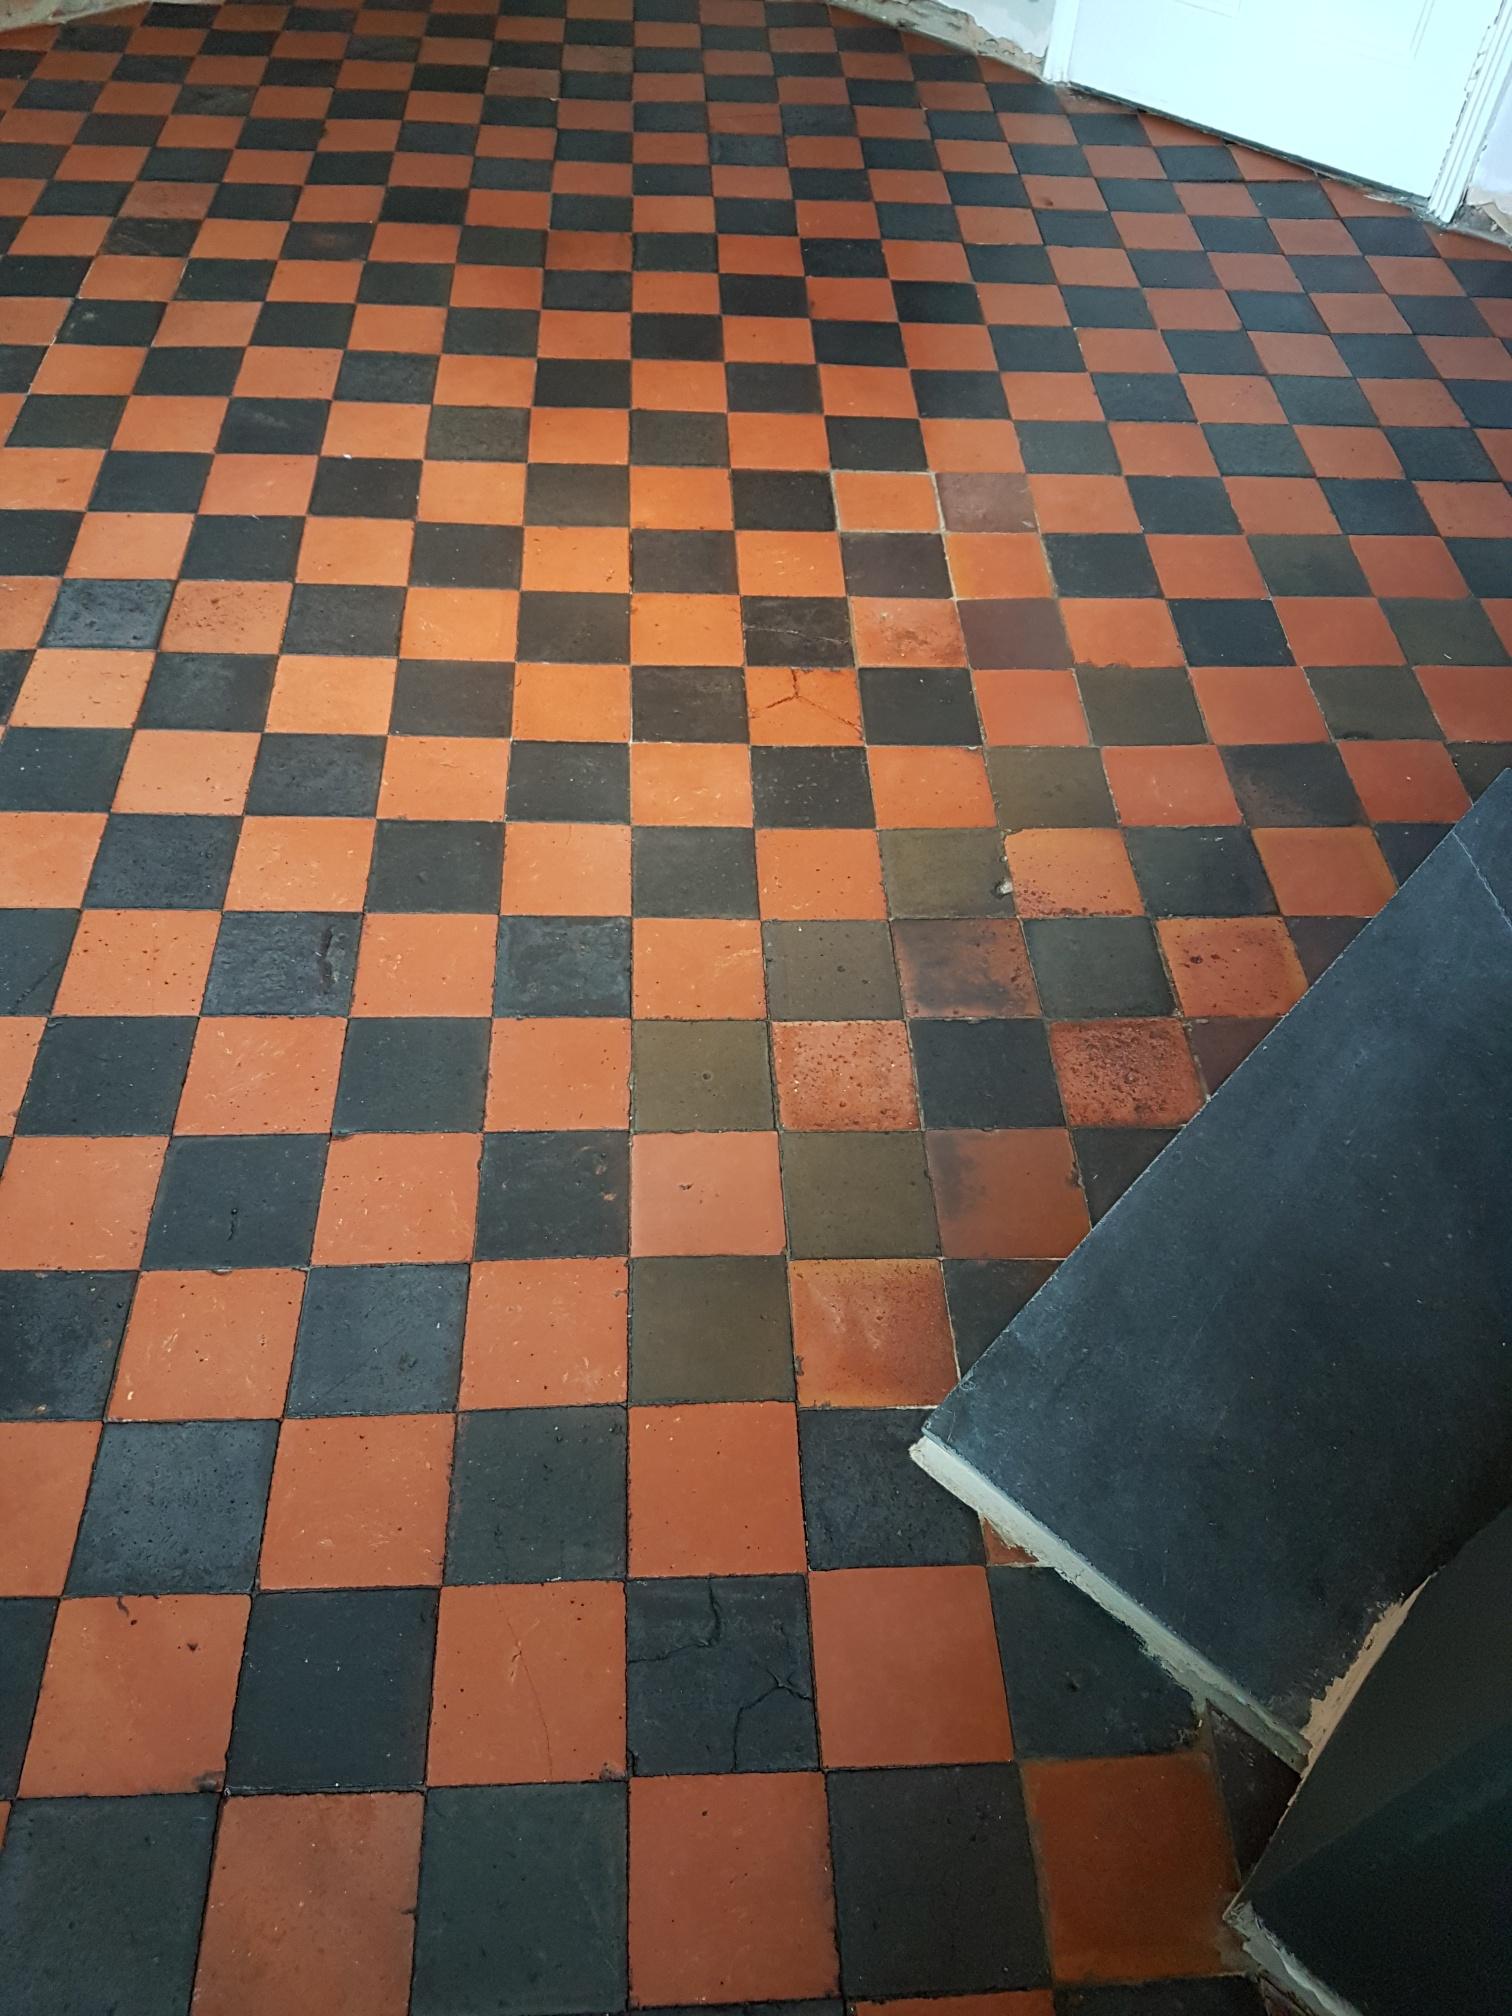 Quarry Tiled Floor After Cleaning Knaresborough